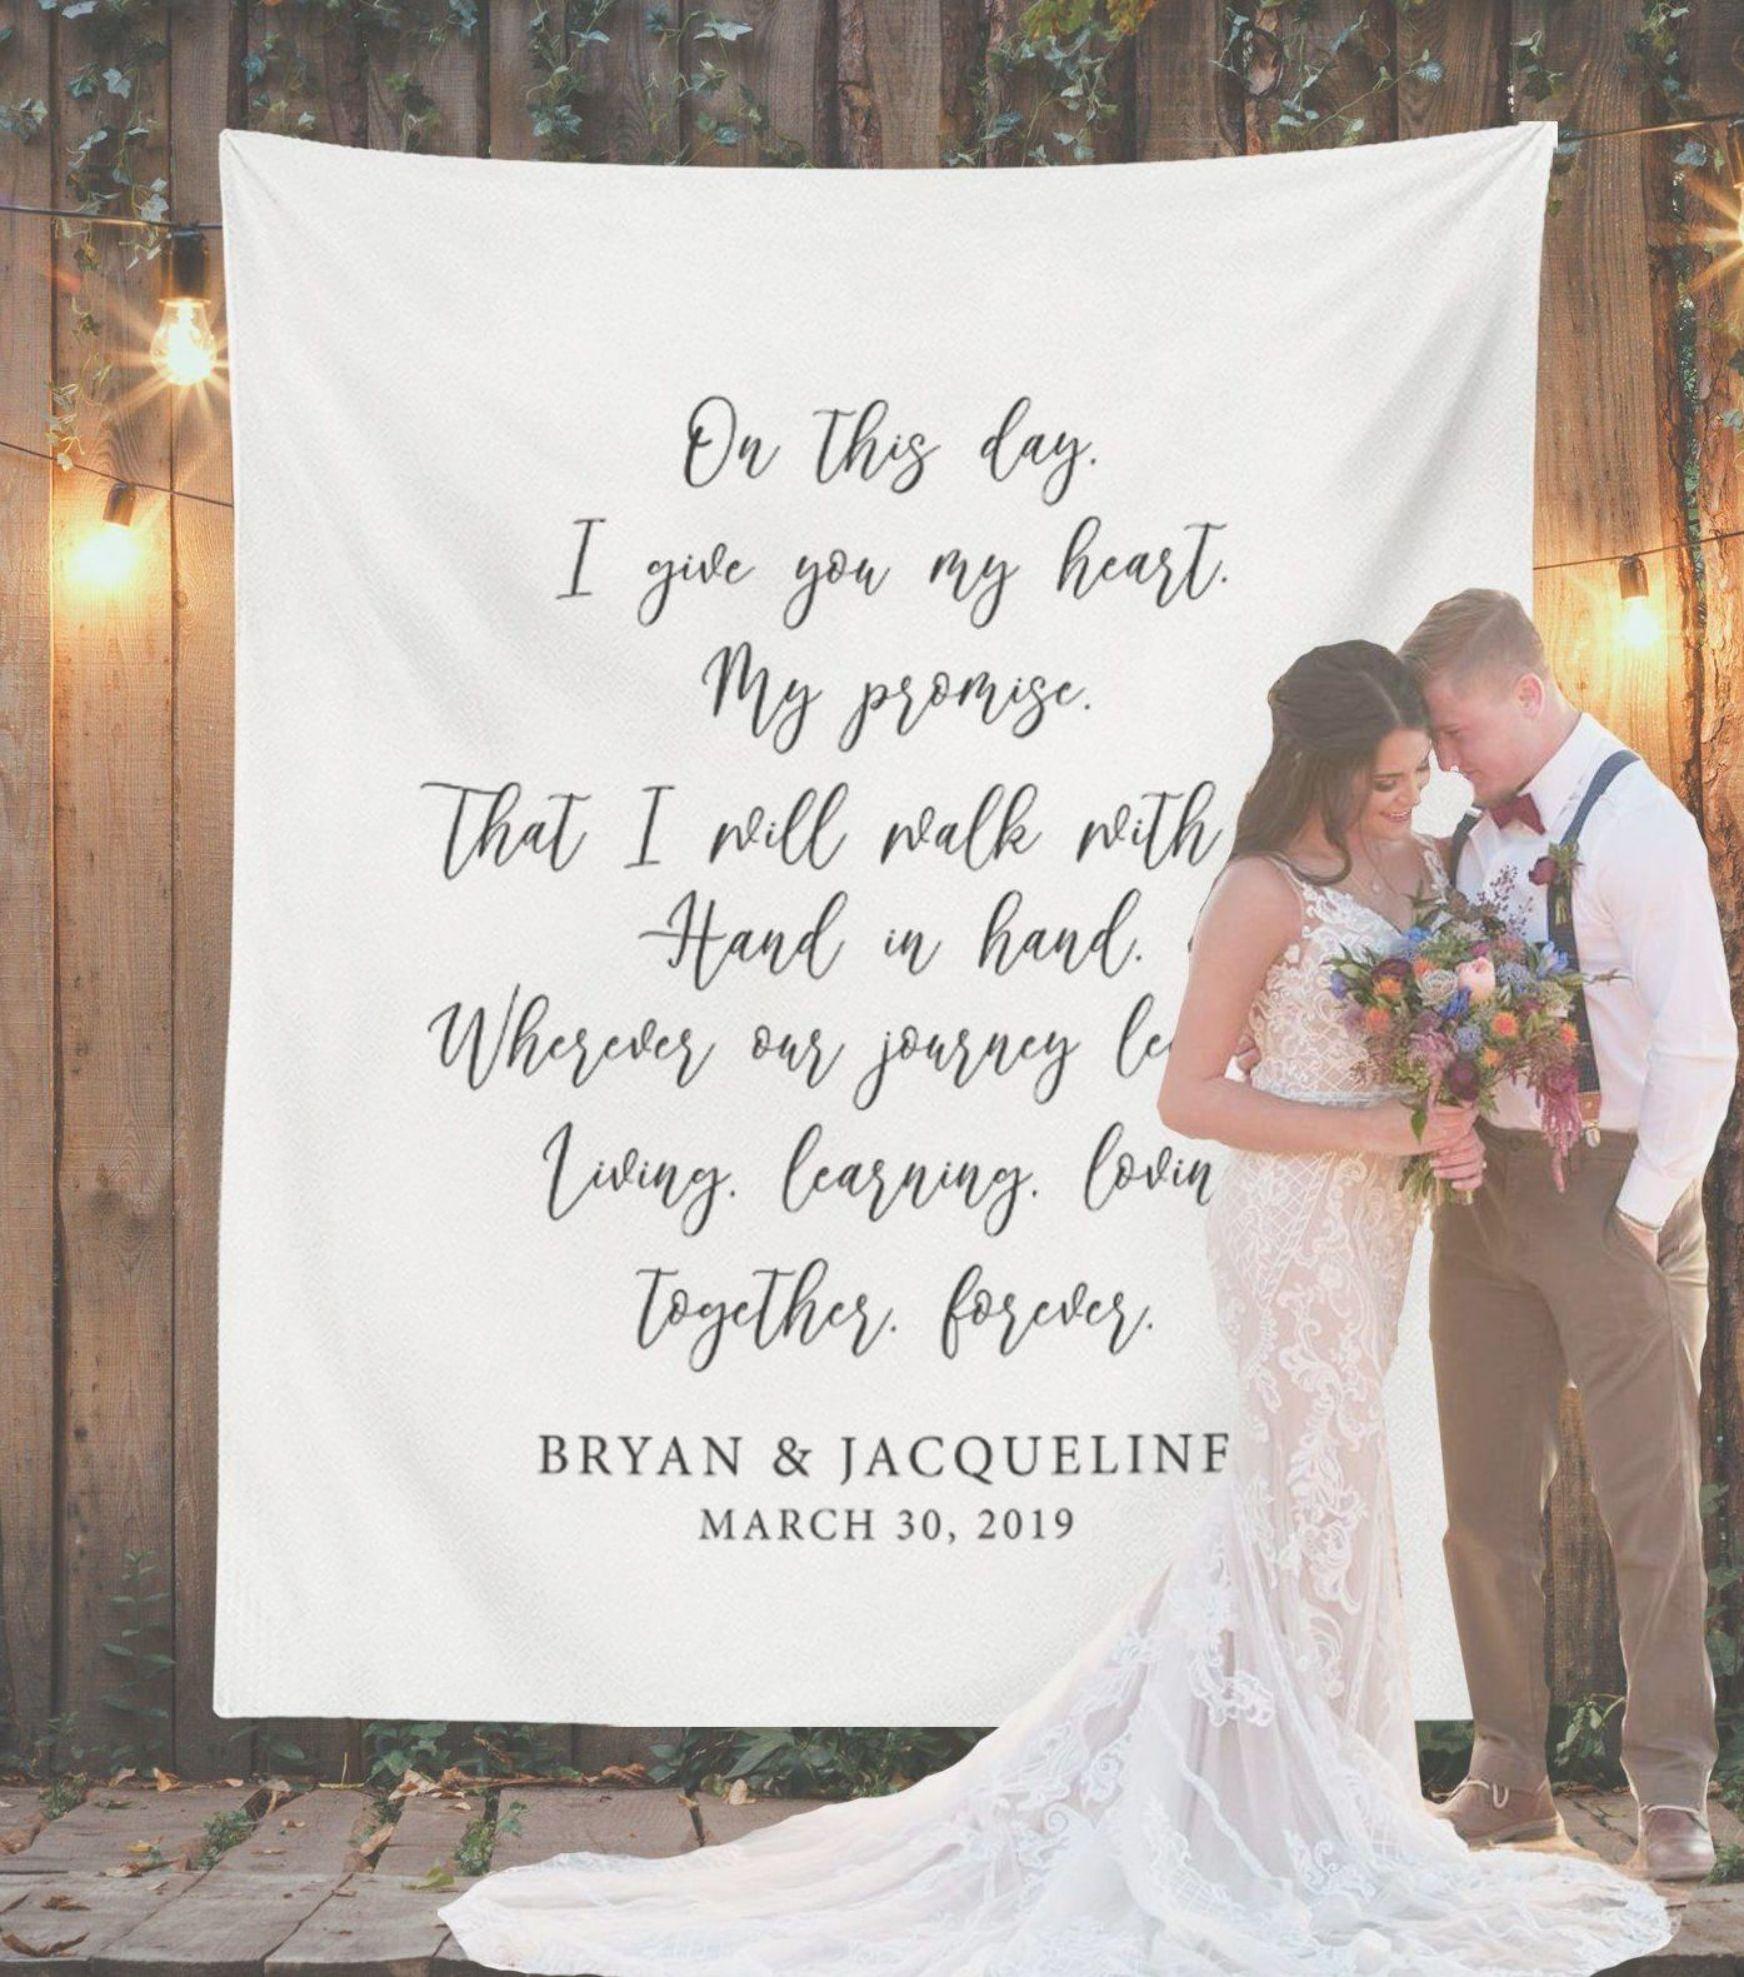 Modern Wedding Backdrop Ideas: Wedding Backdrop Ideas Personalized Wedding Backdrop